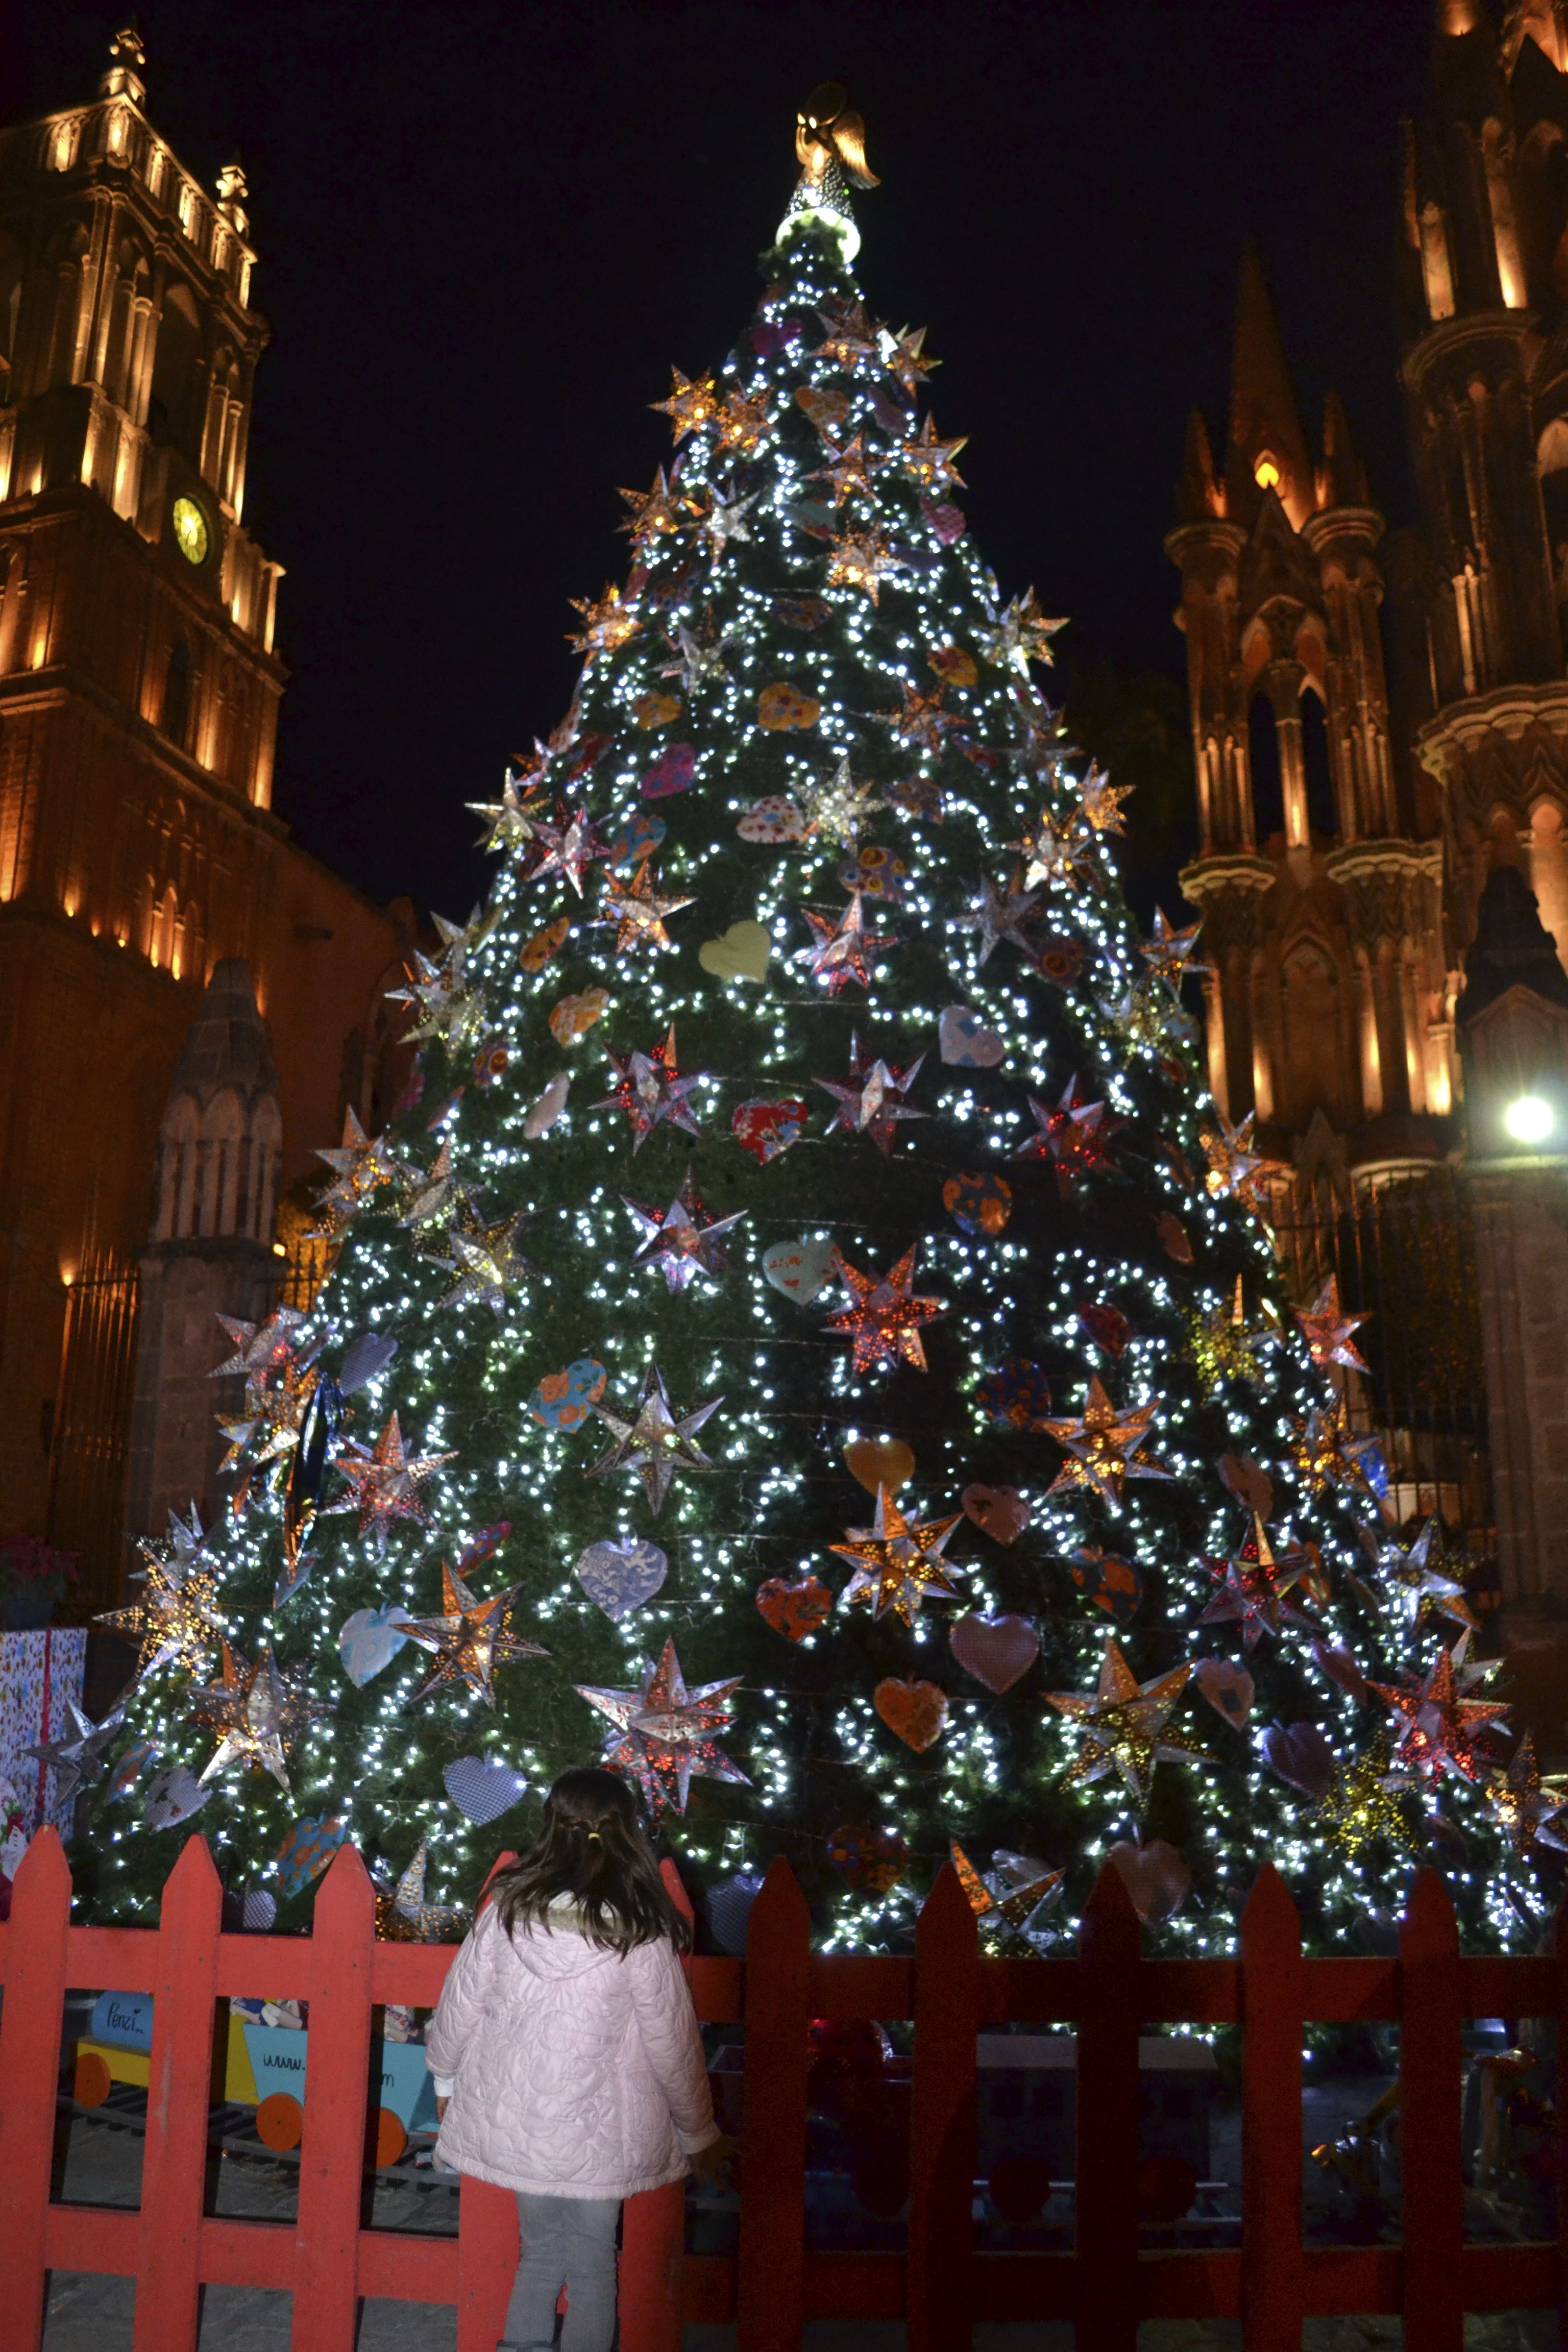 Christmas Vacation In Mexico.Christmas In Guanajuato Mexico Cuba Christmas